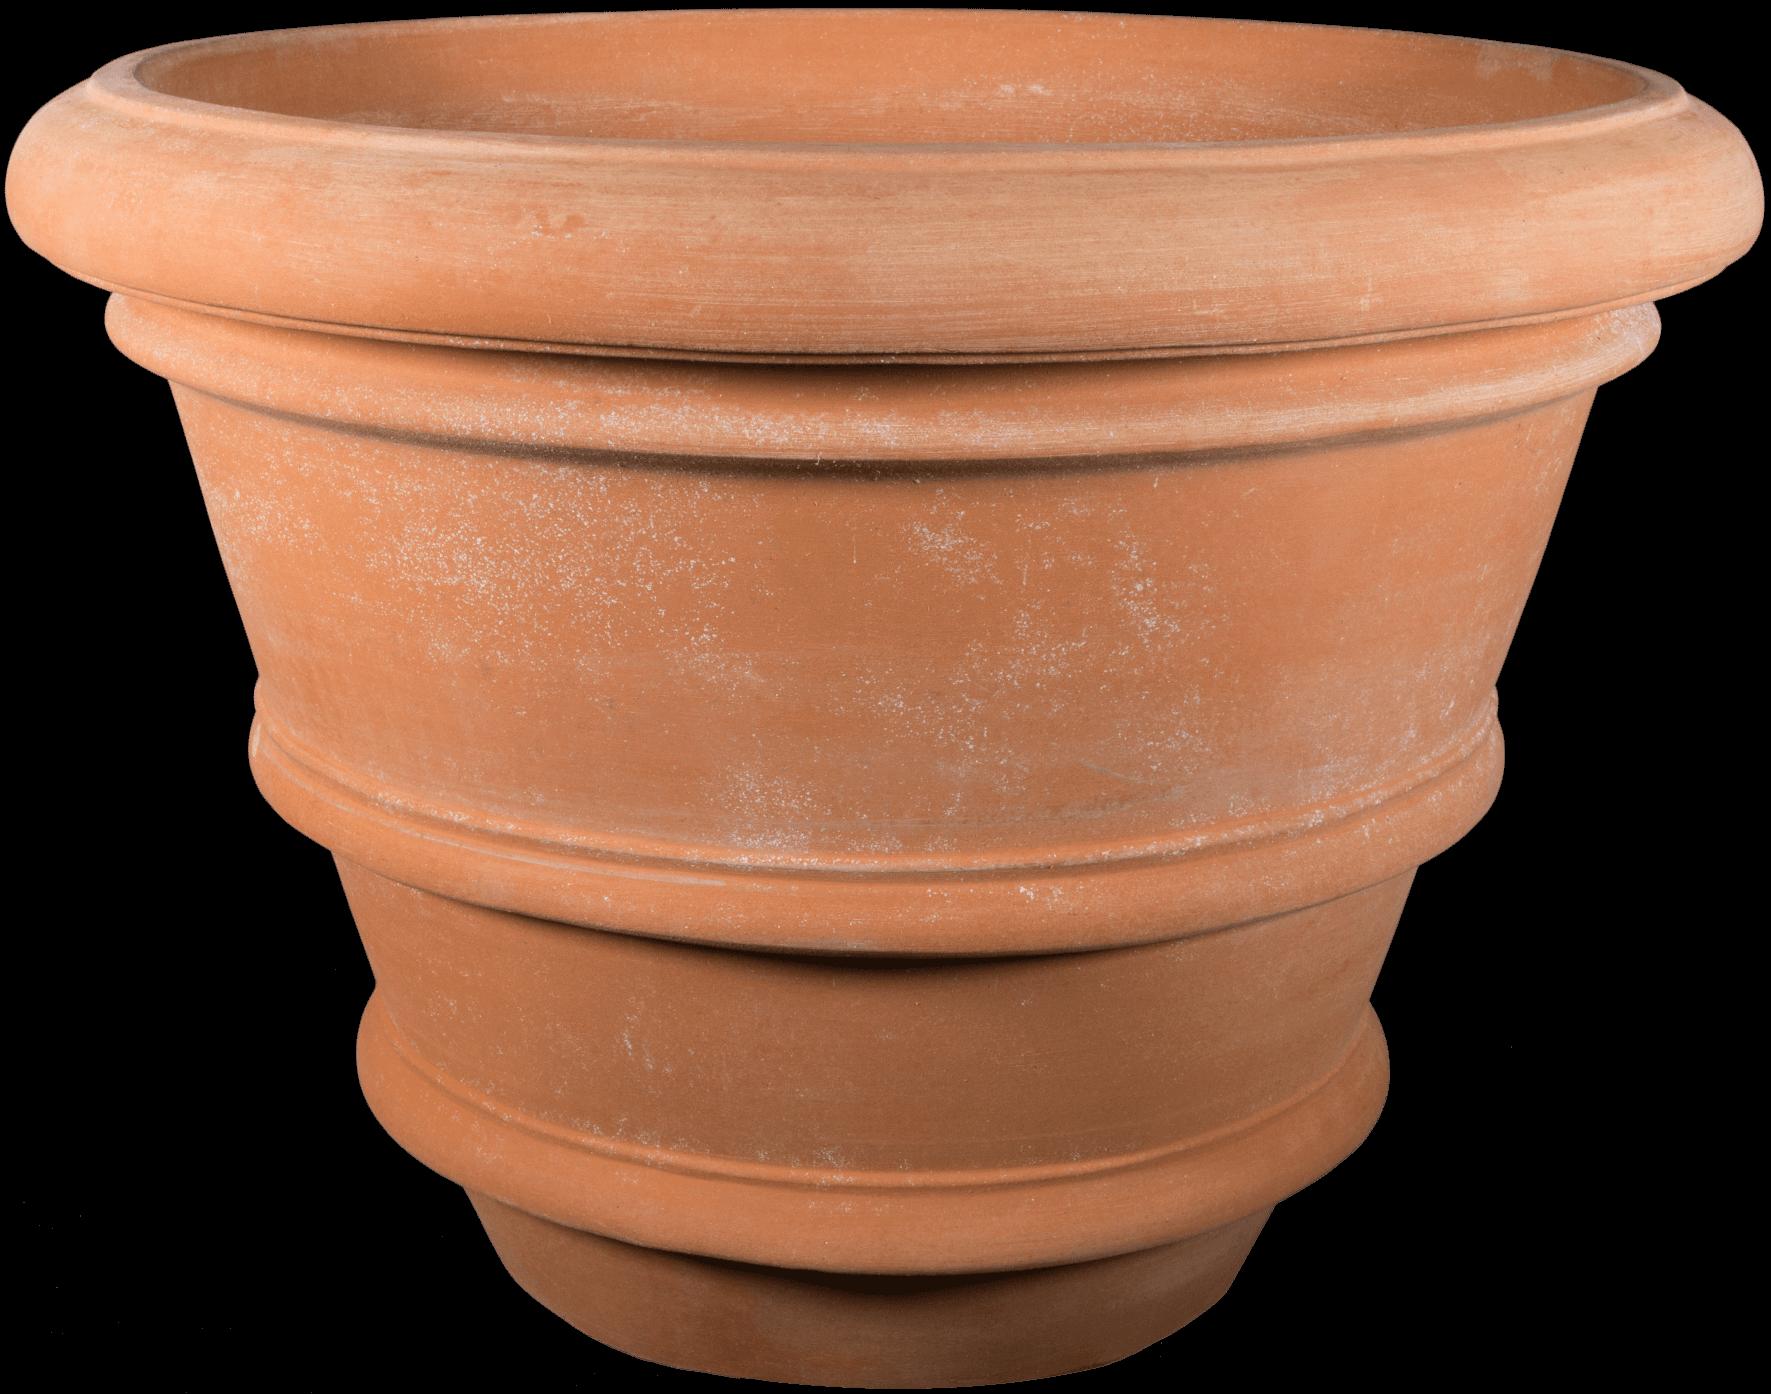 Clay Pot Png & Free Clay Pot.png Transparent Images #10338.